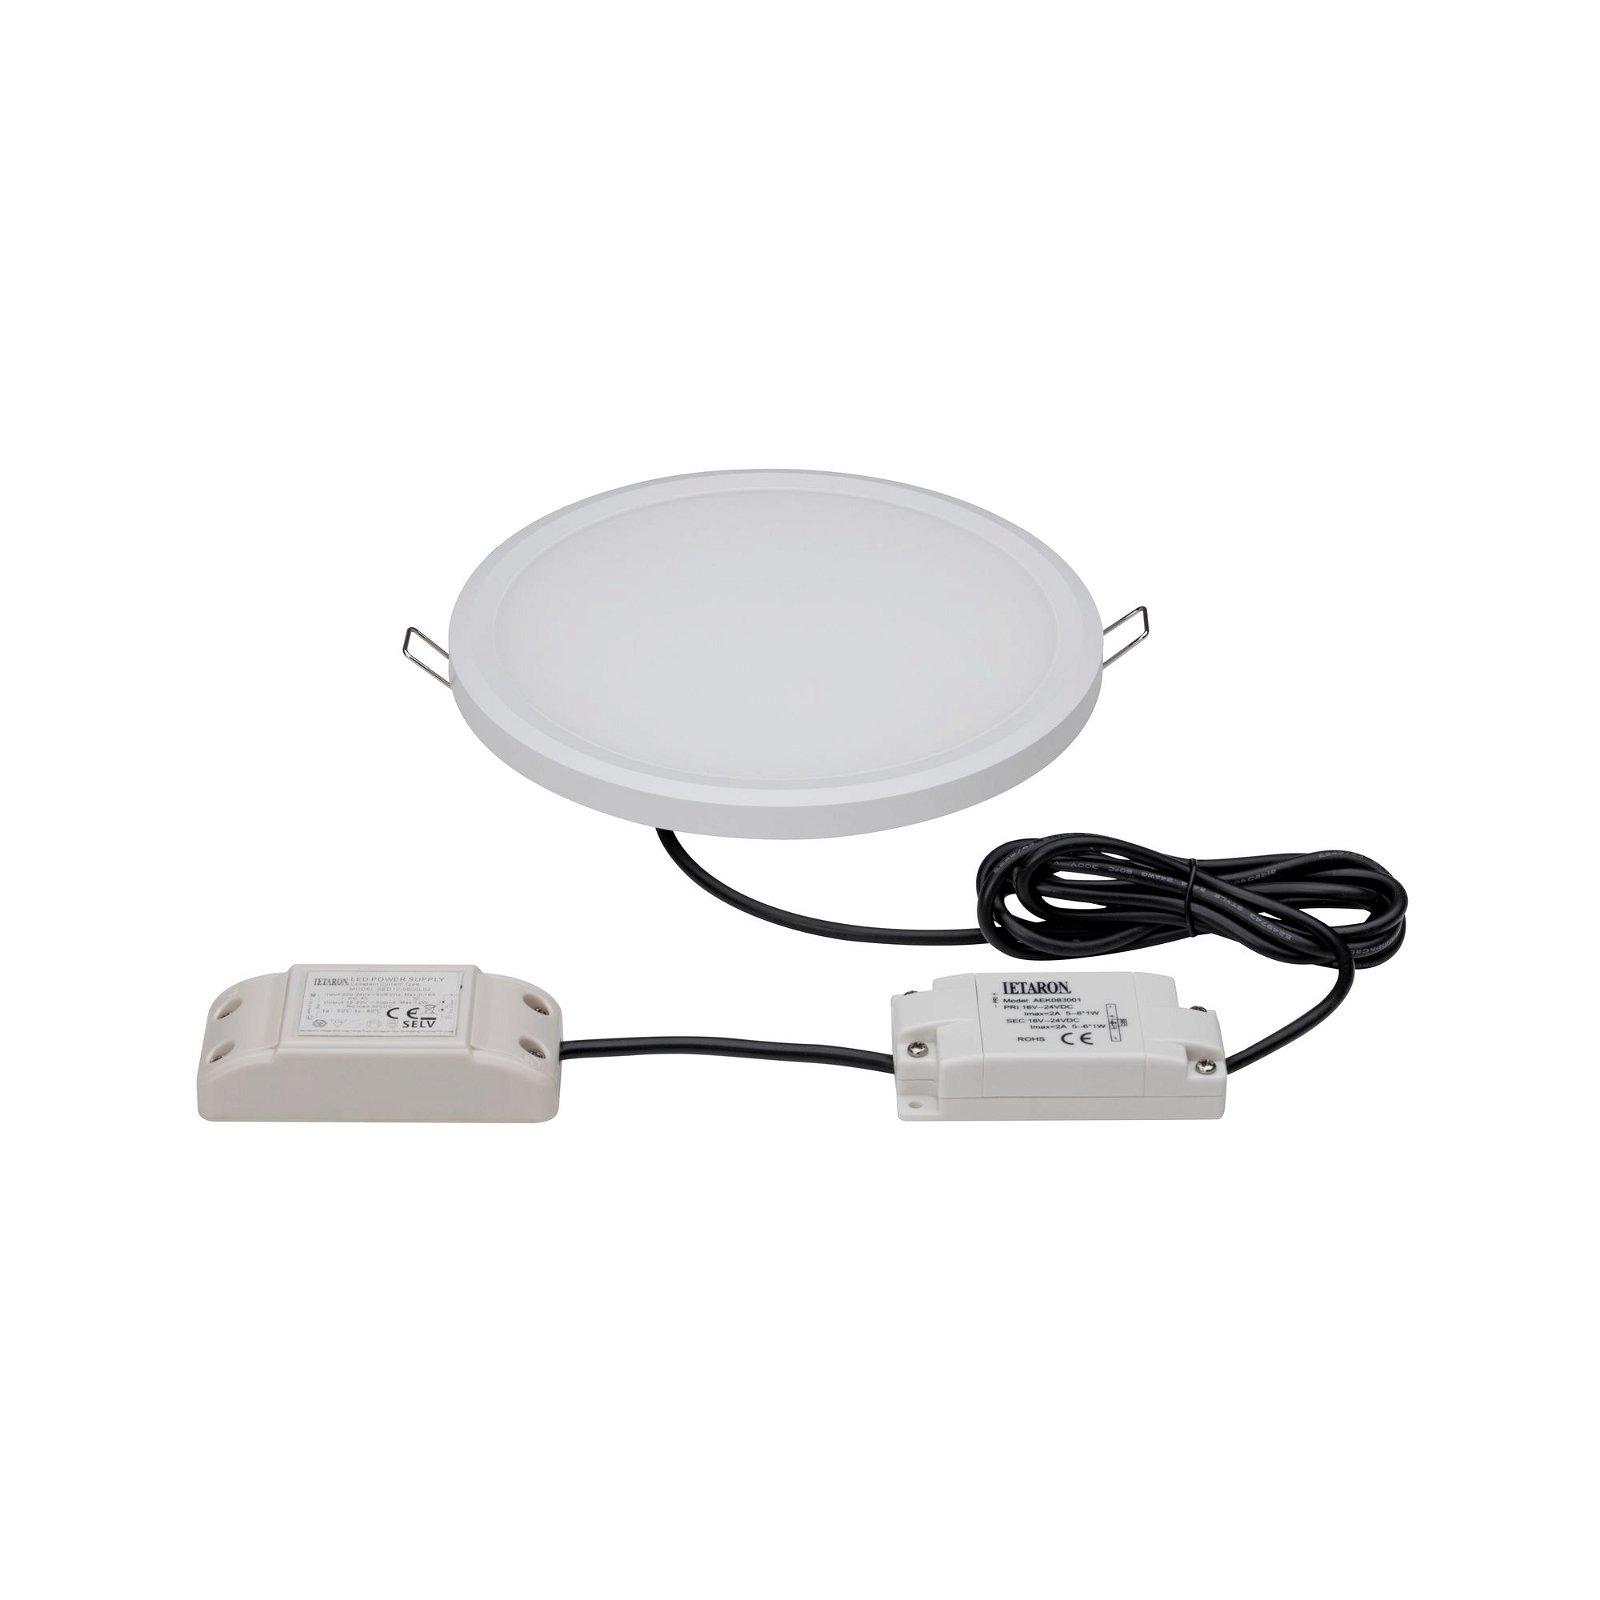 Panneau encastrable LED WarmDim IP65 rond 9W Blanc